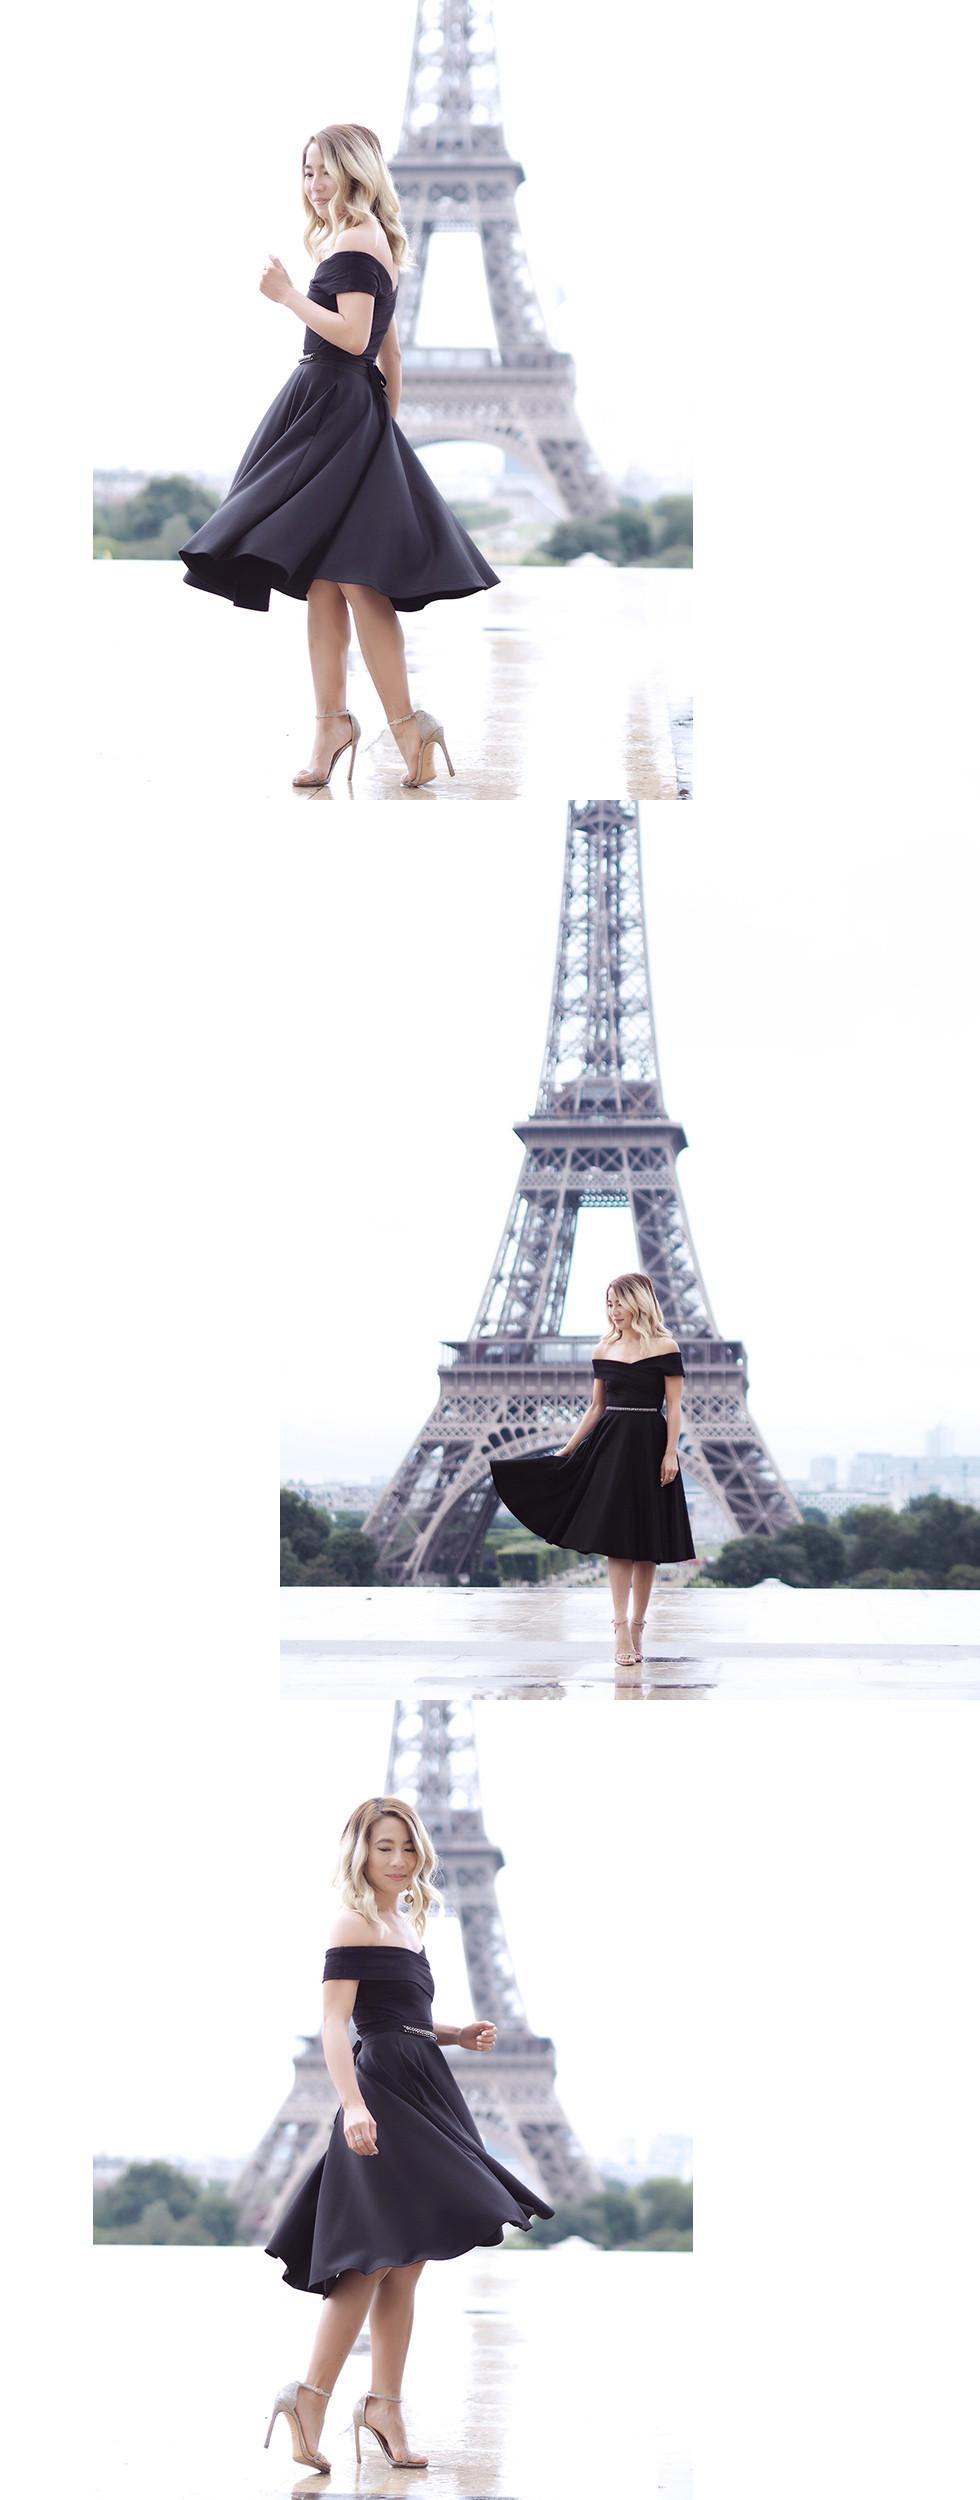 Eiffel Tower | Lam in Louboutins